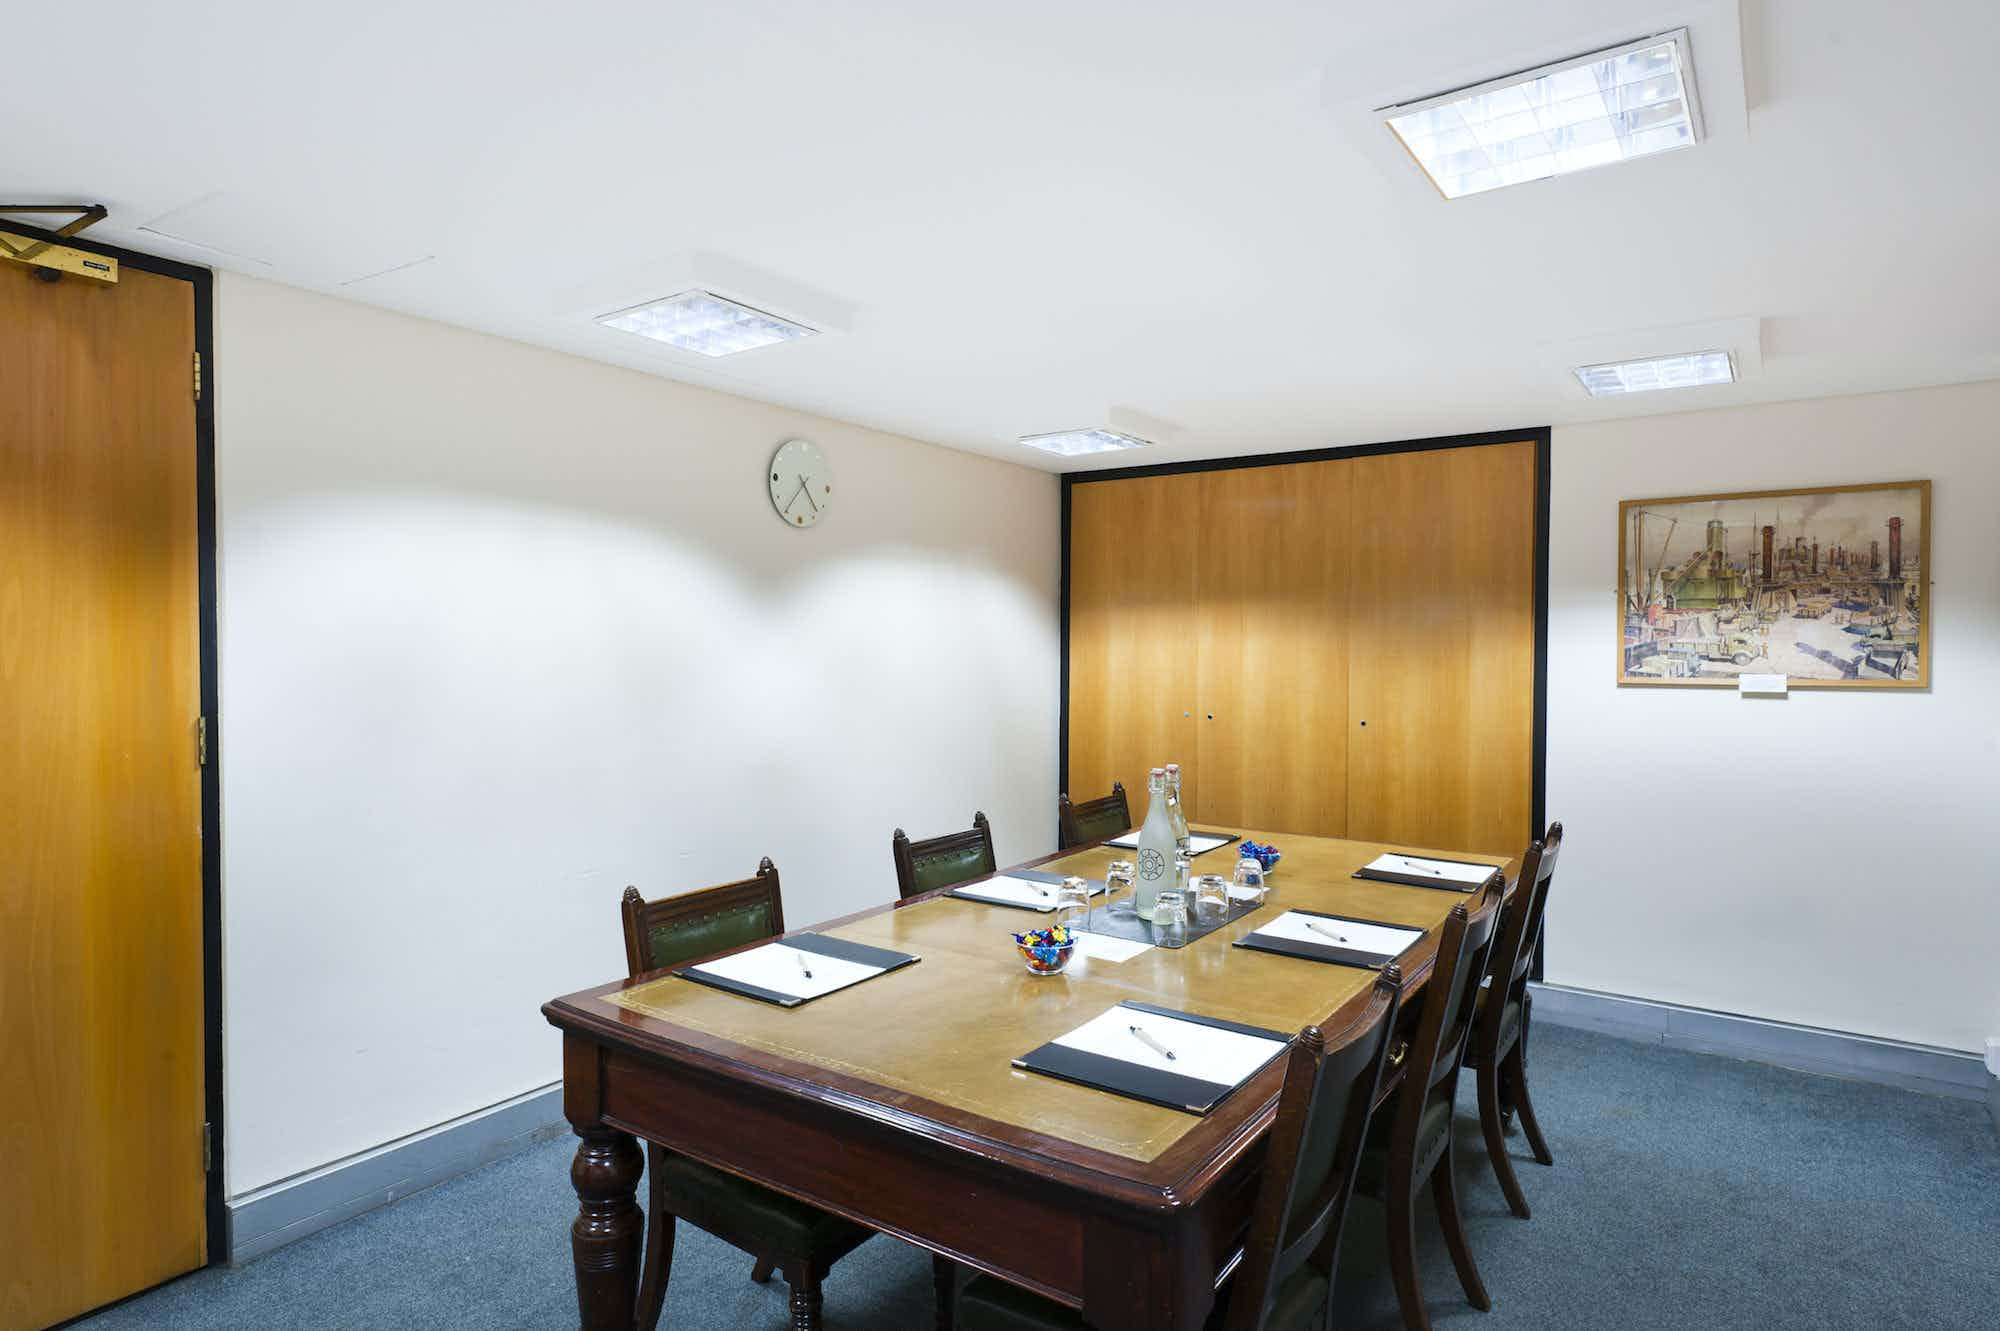 Bailey Room, One Great George Street